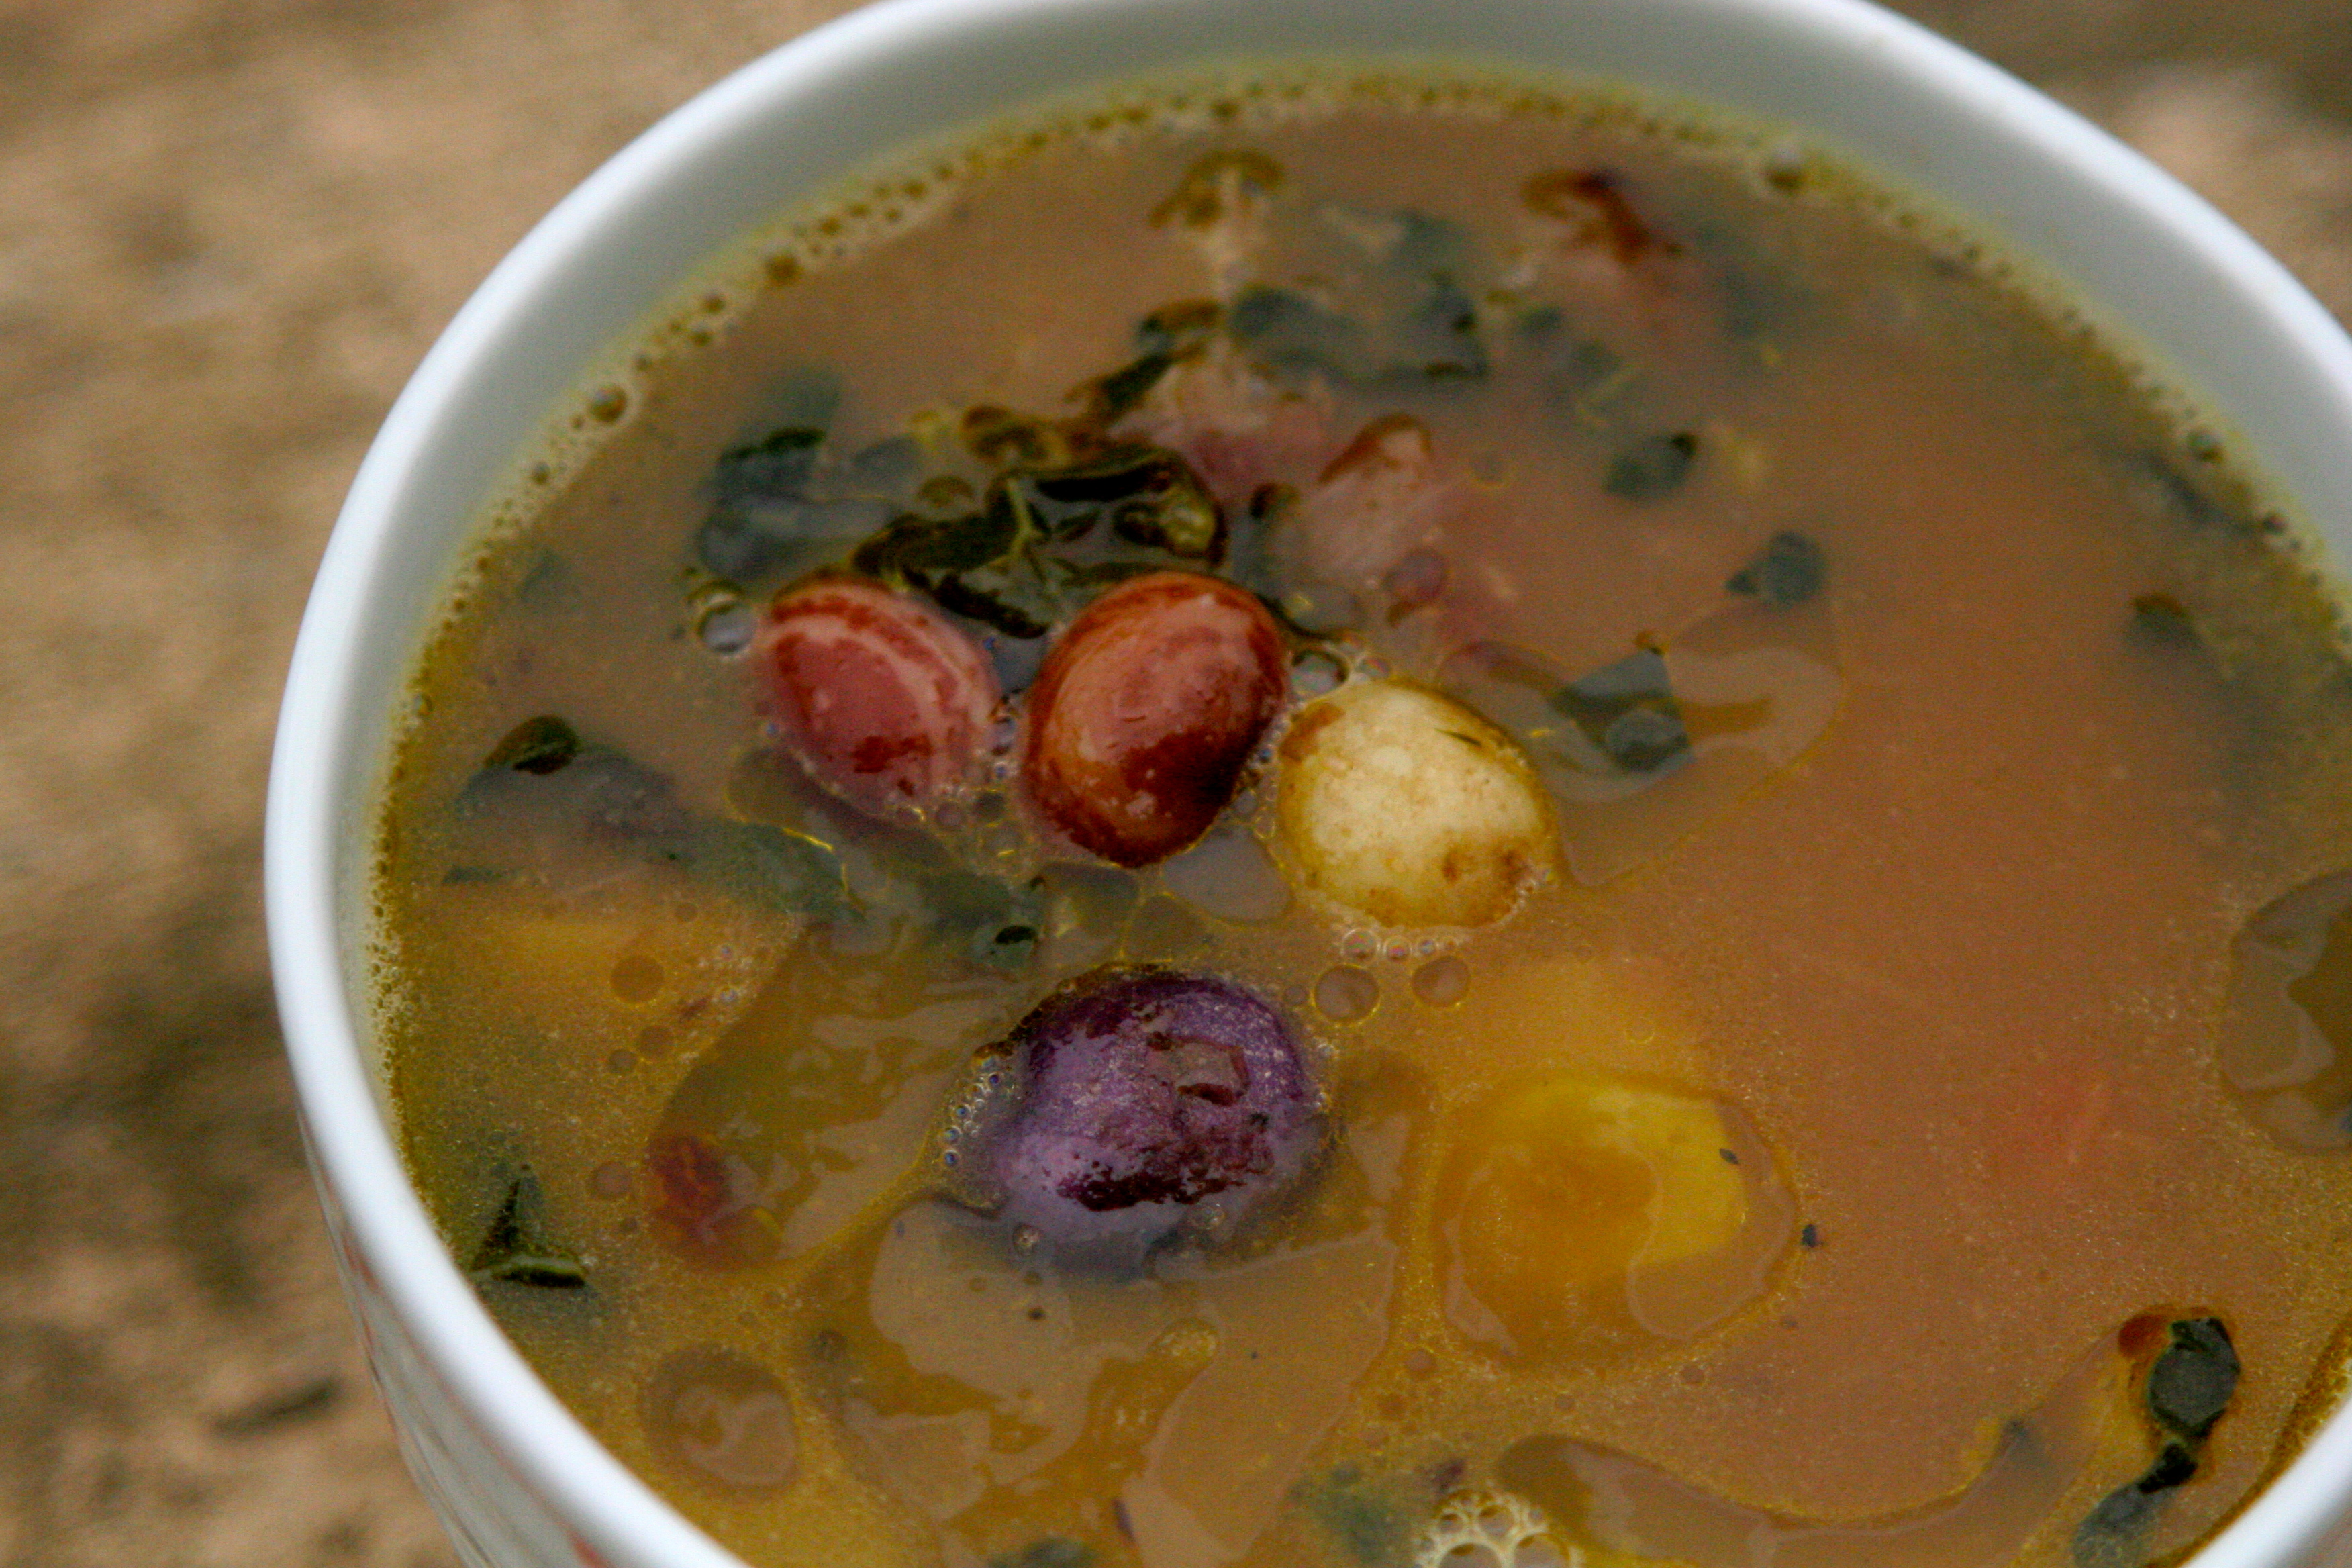 winter garden soup kale potato bean and lemon la cuoca ciccia